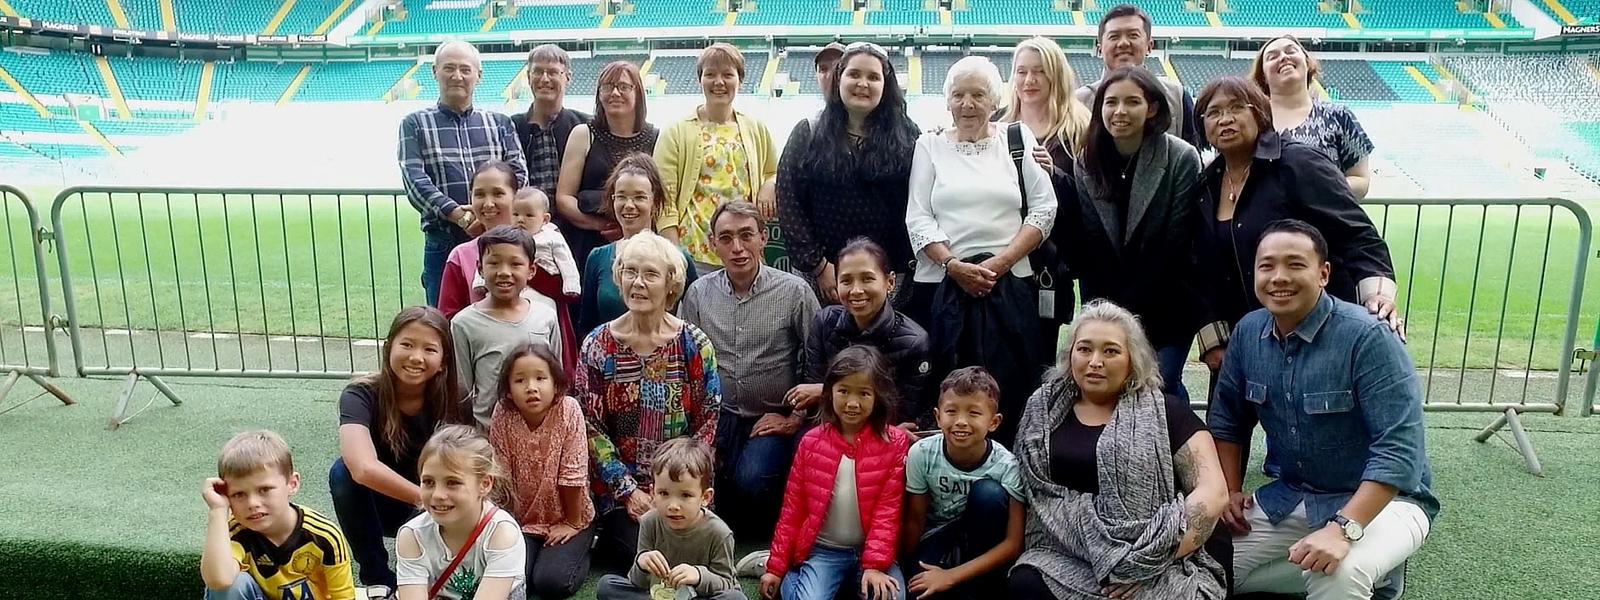 Family Reunion at Celtic Park